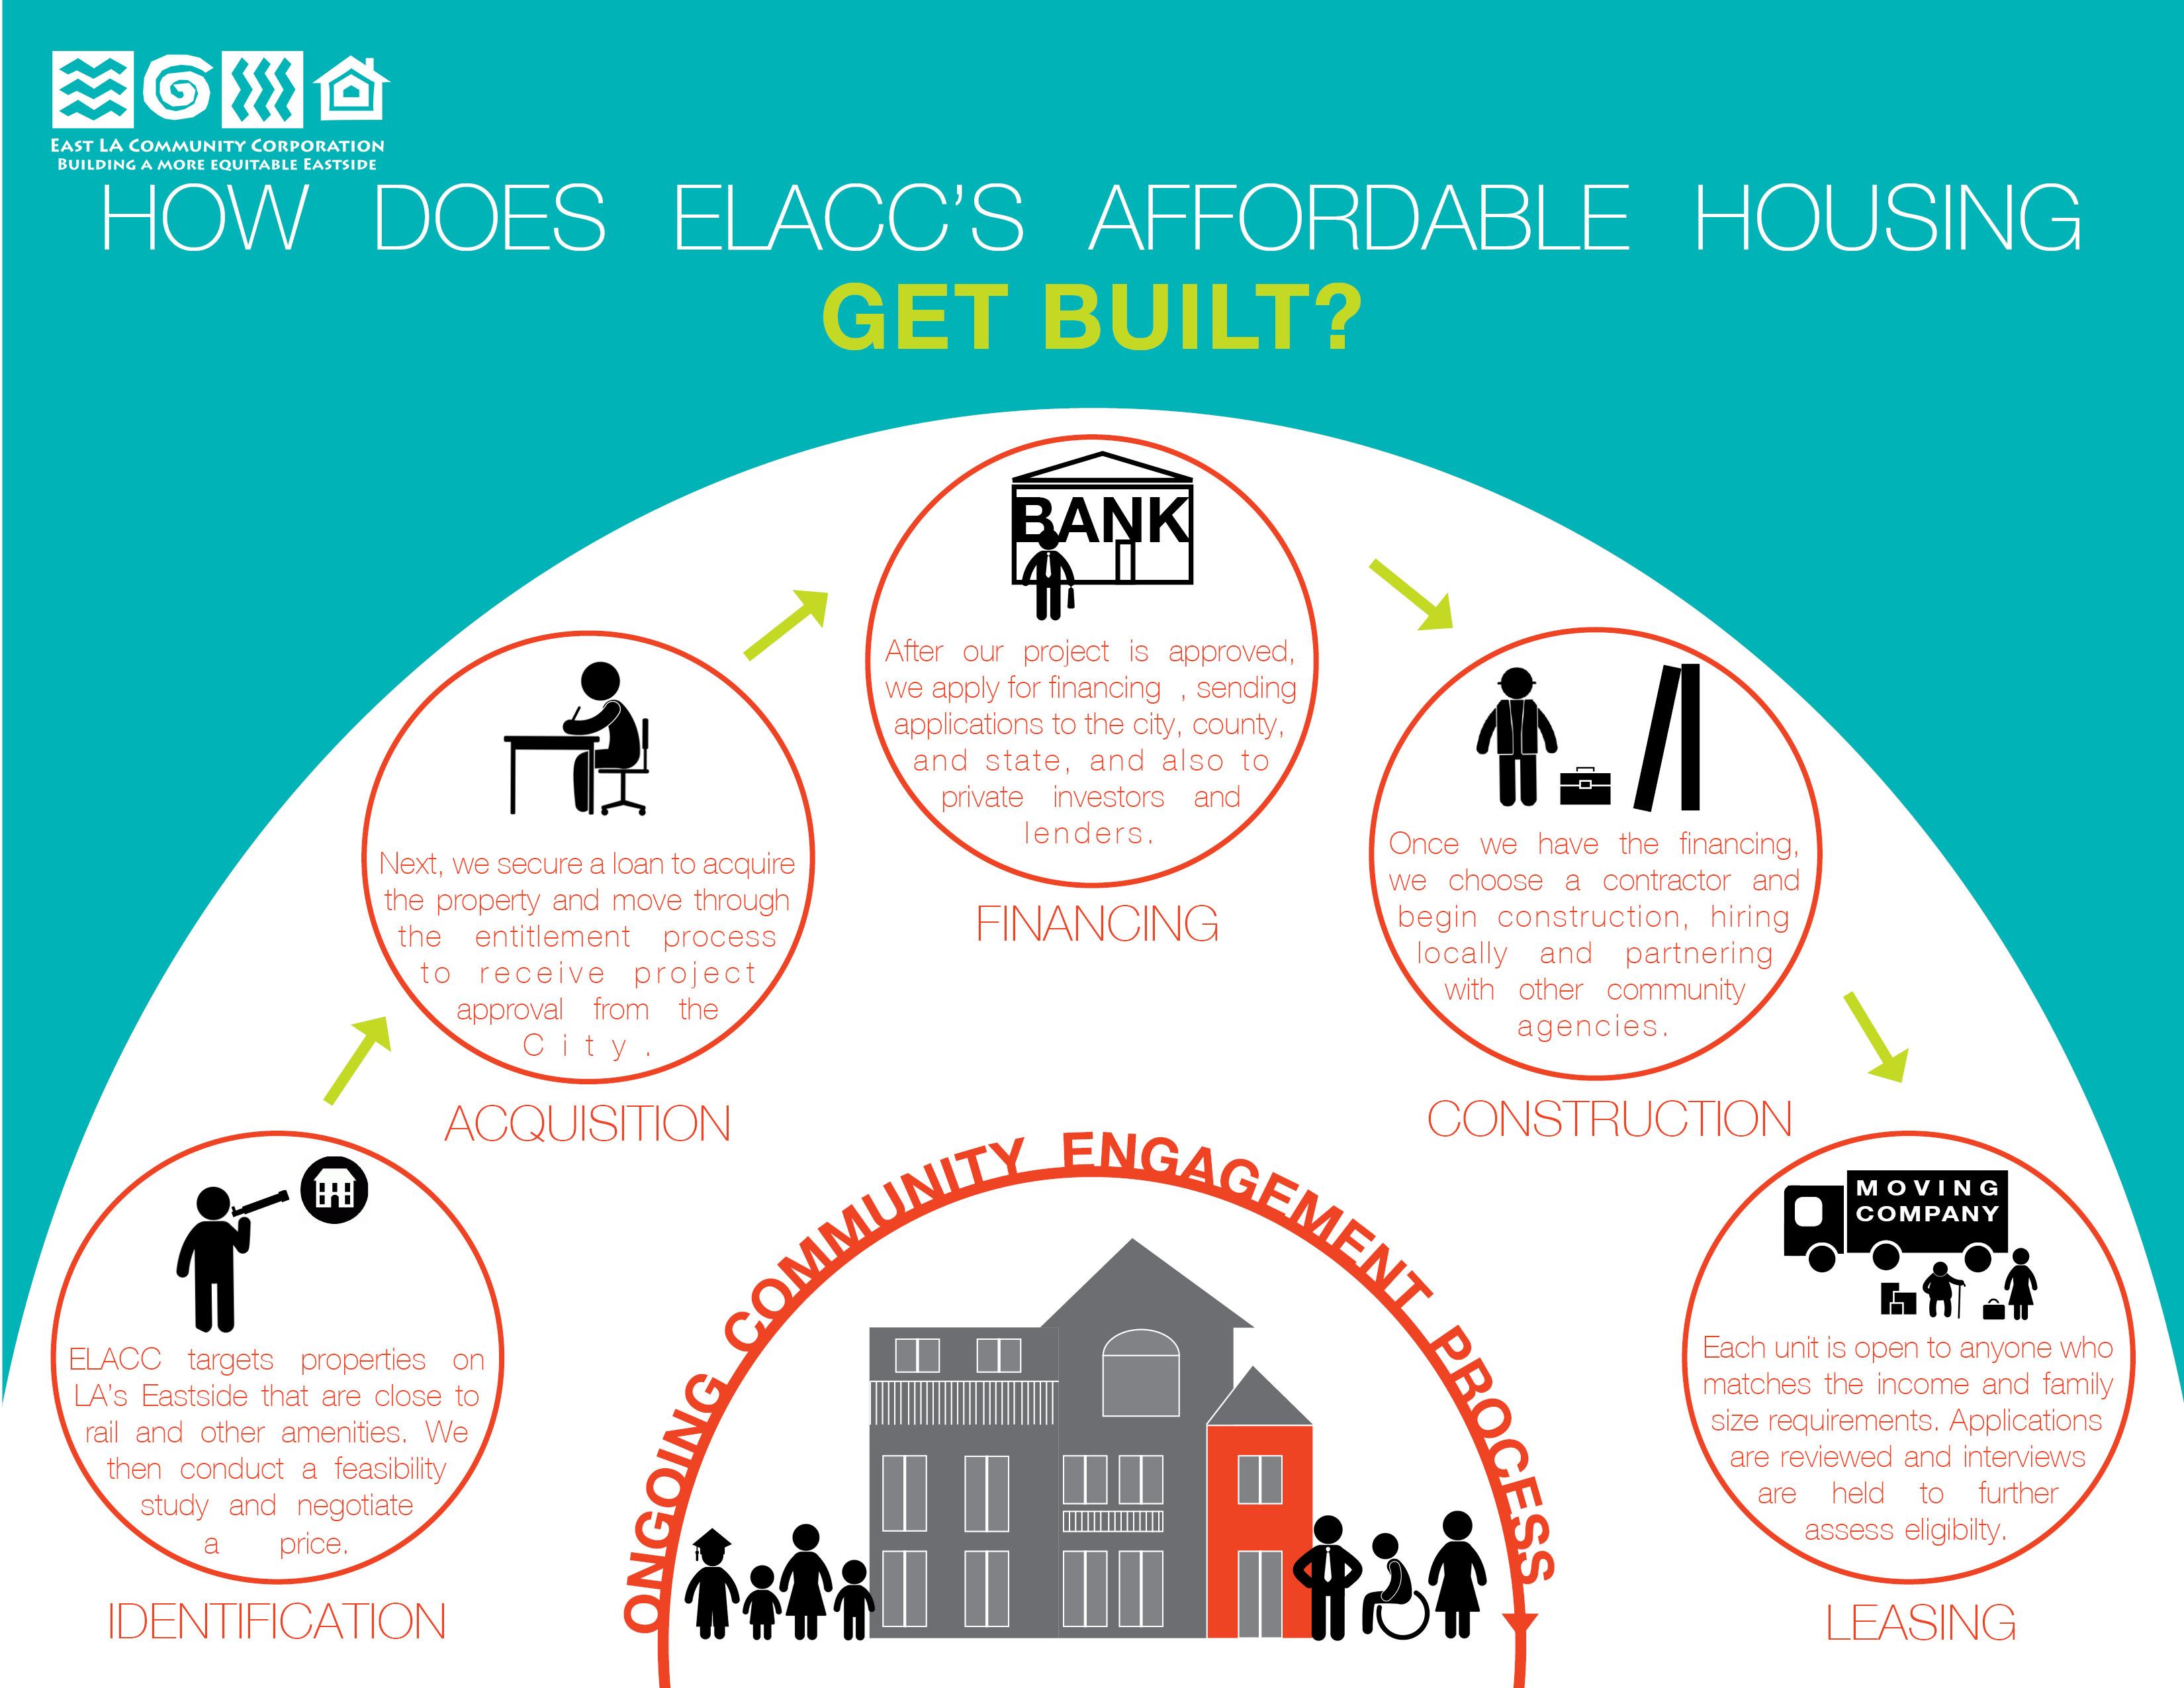 1_-_How_ELACCs_Affordable_Housing_Gets_Built.jpg